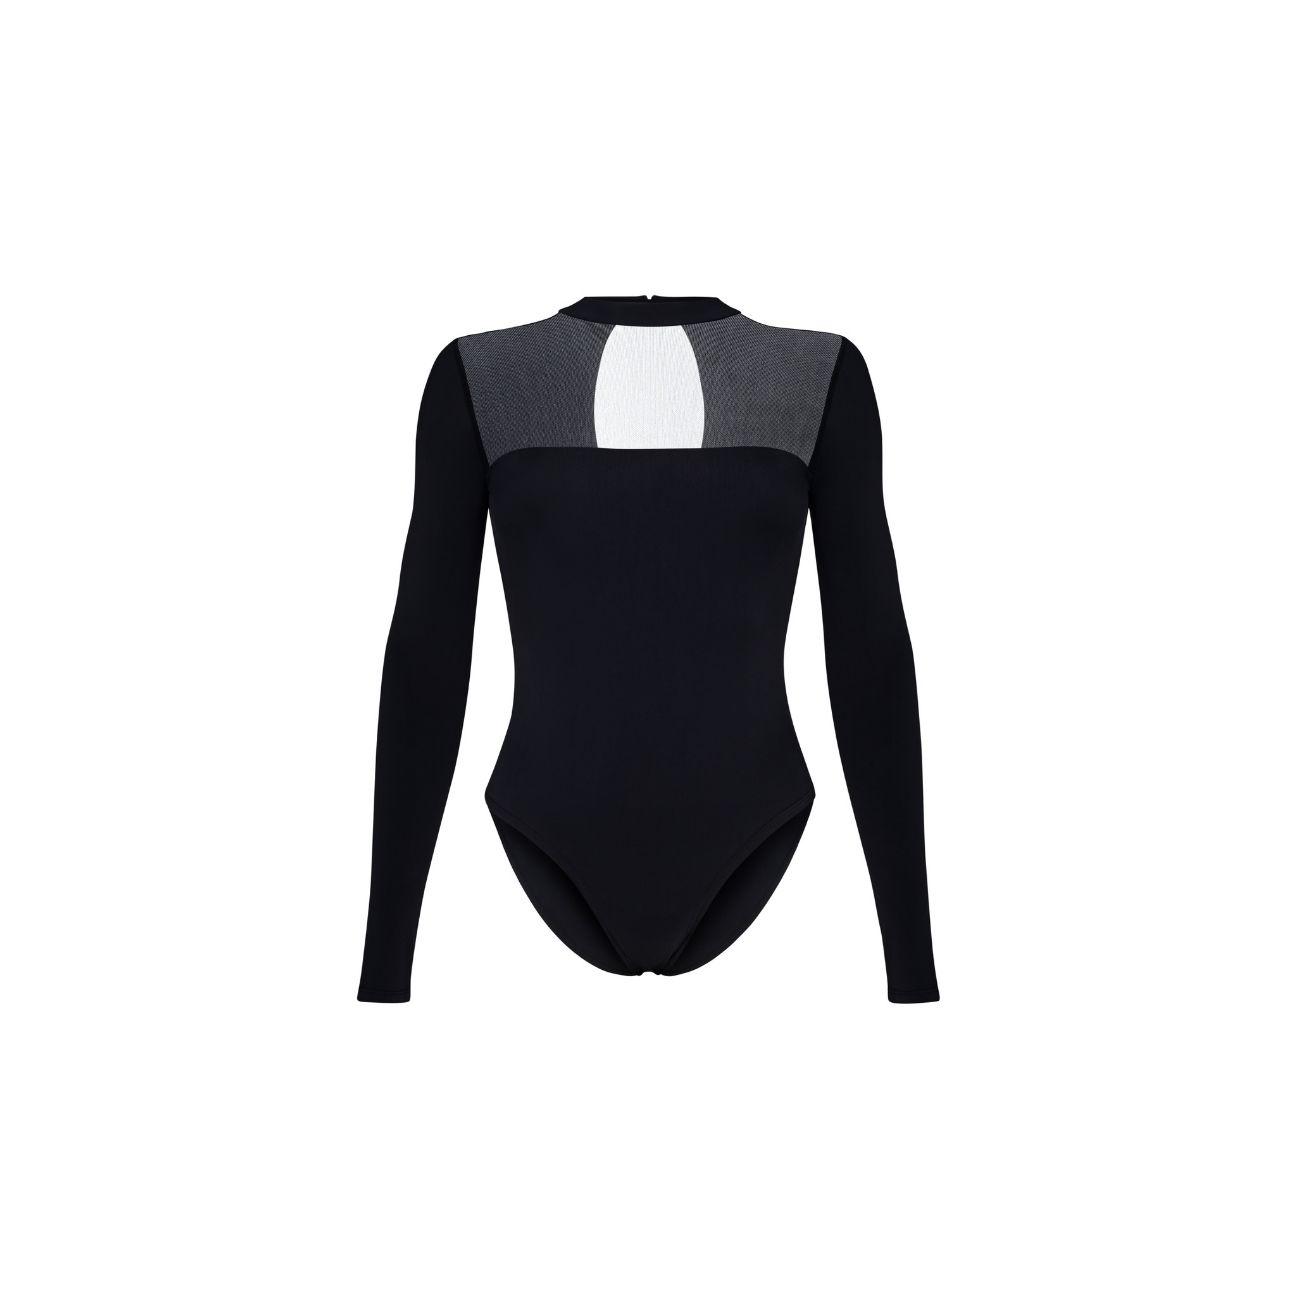 Sport Angel women's illinois bodysuit